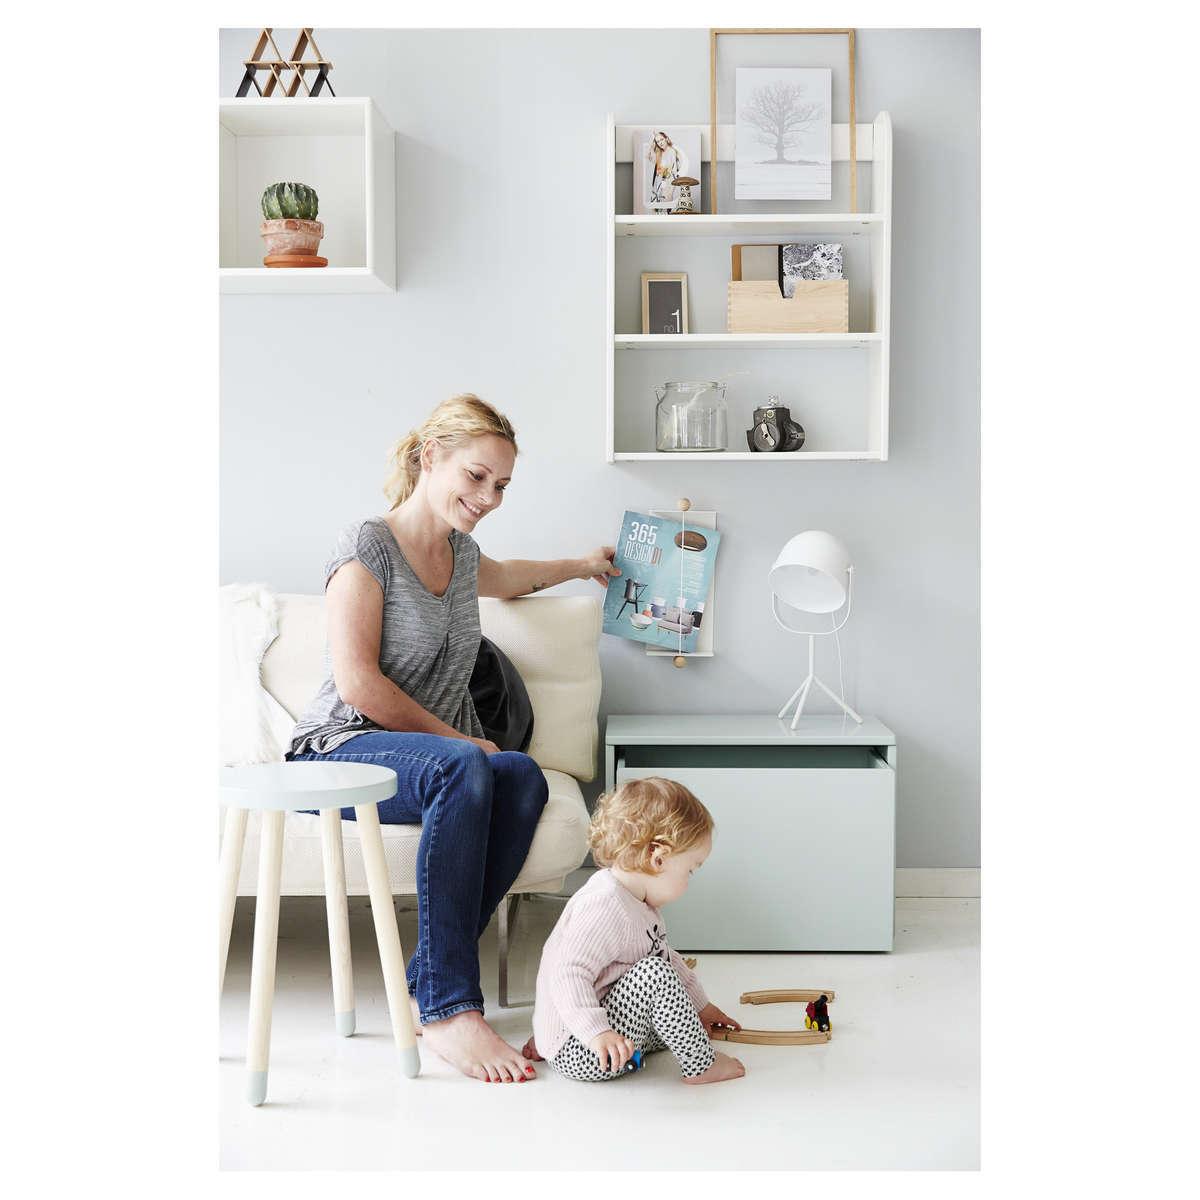 Flexa etag re play blanc tag re flexa sur l 39 armoire - L armoire de bebe ...